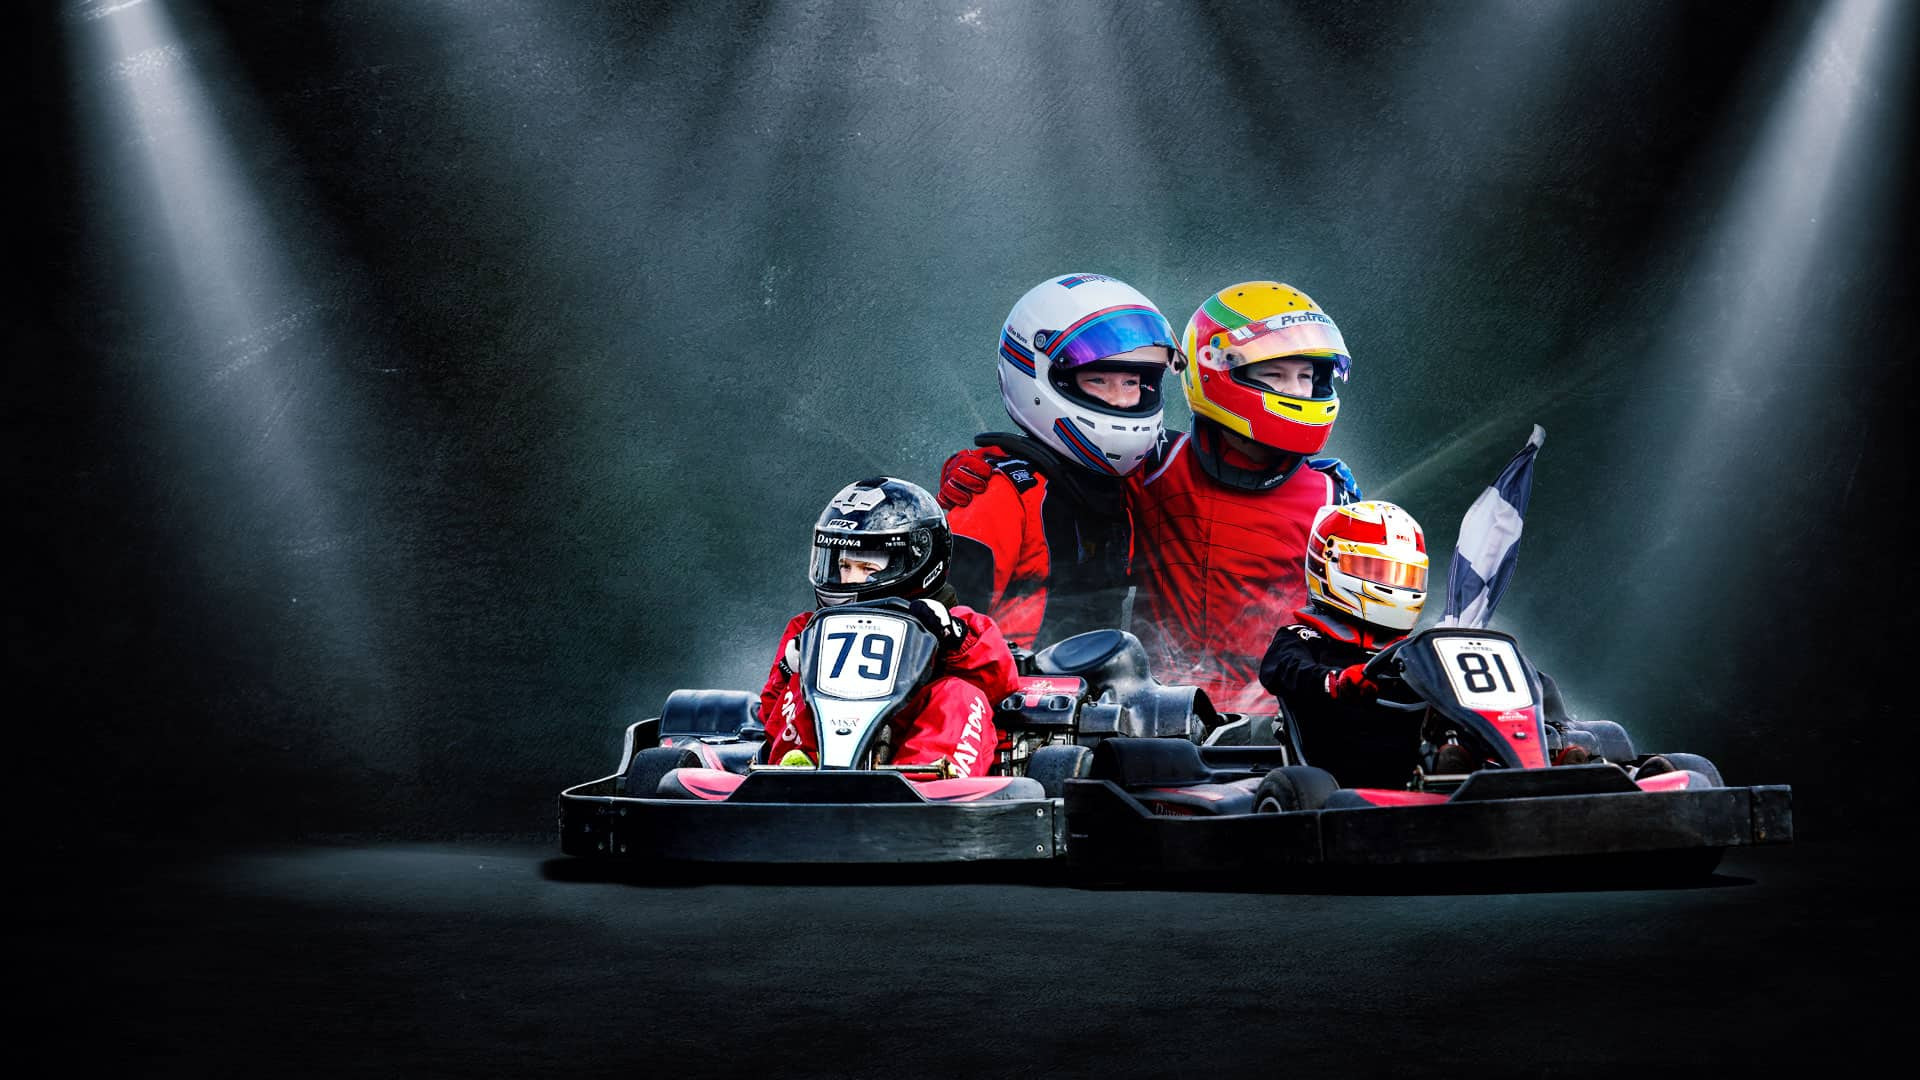 Fast track their racing career with Daytona